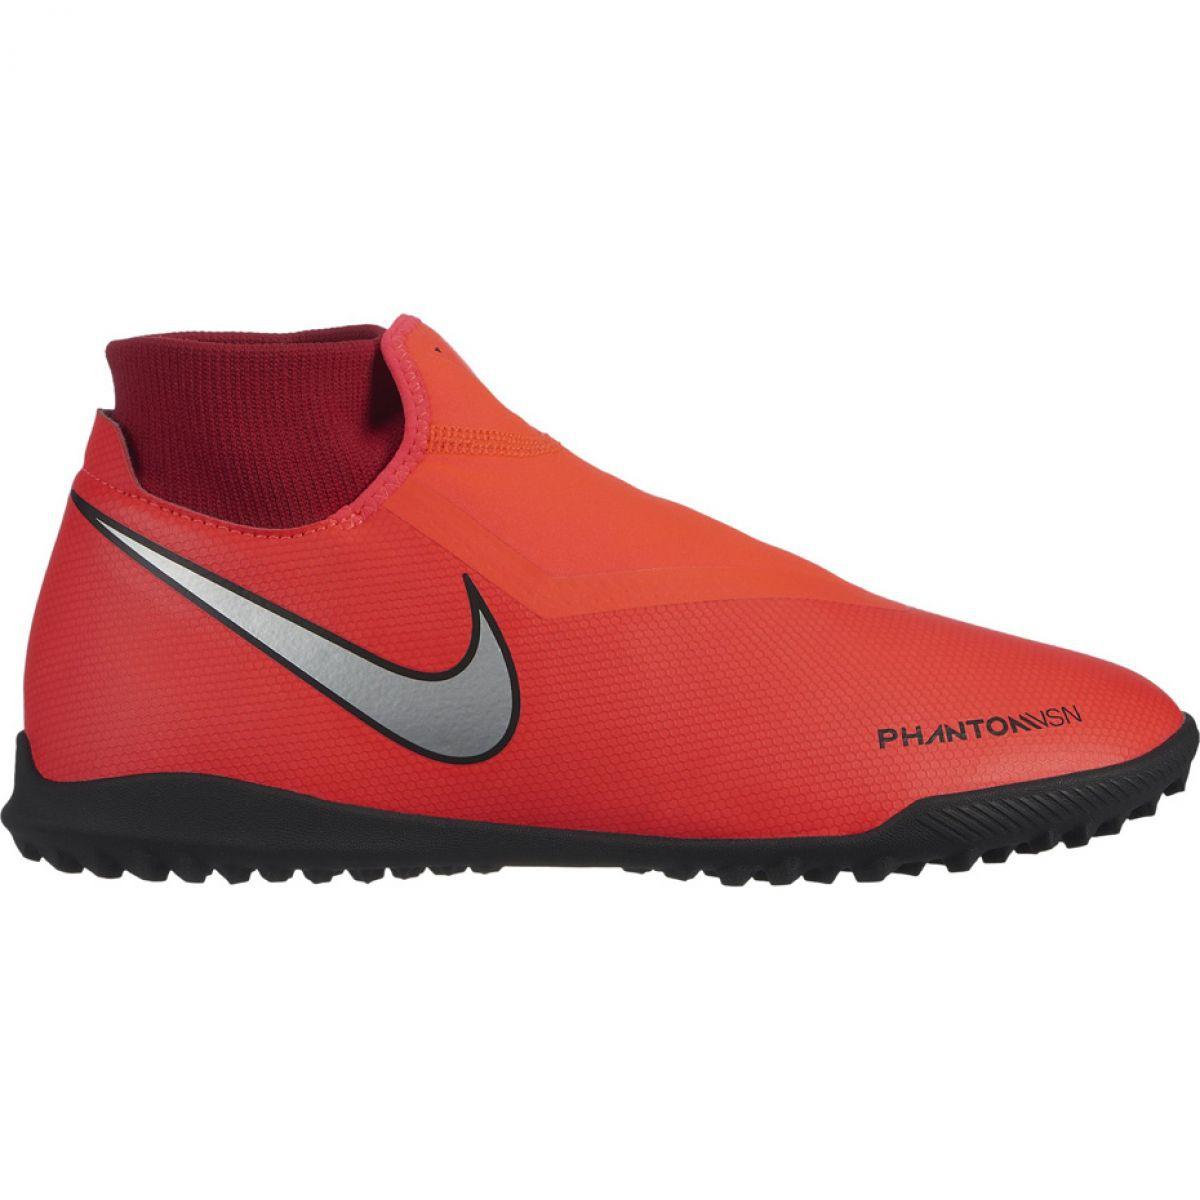 zapatillas de futbol   Ofertas Zapatillas Nike Phantom VSN